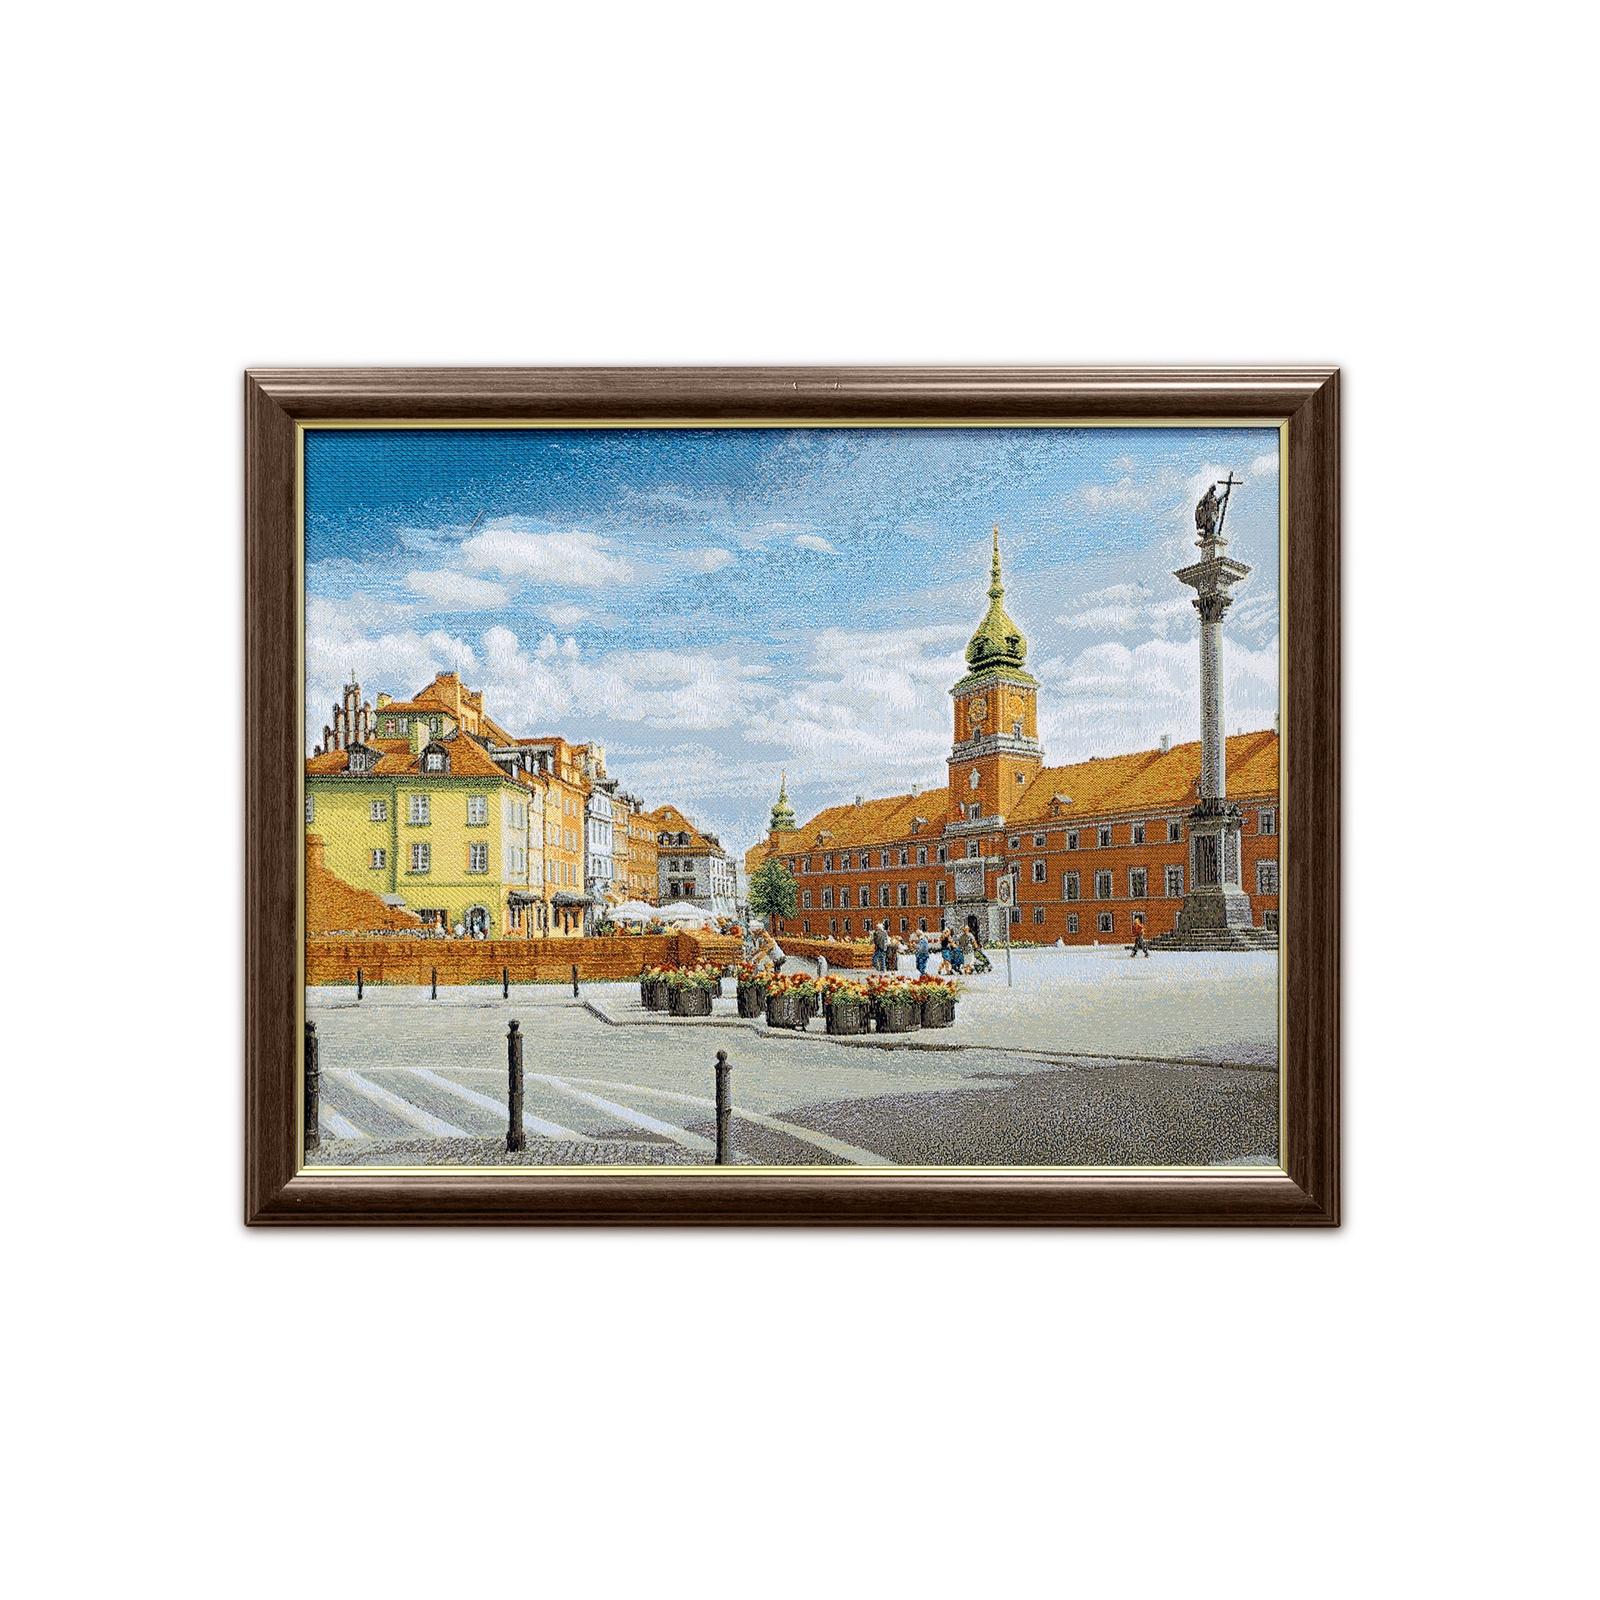 Картина Магазин гобеленов Варшава 40*51 см, Гобелен стоимость авиабилета москва варшава